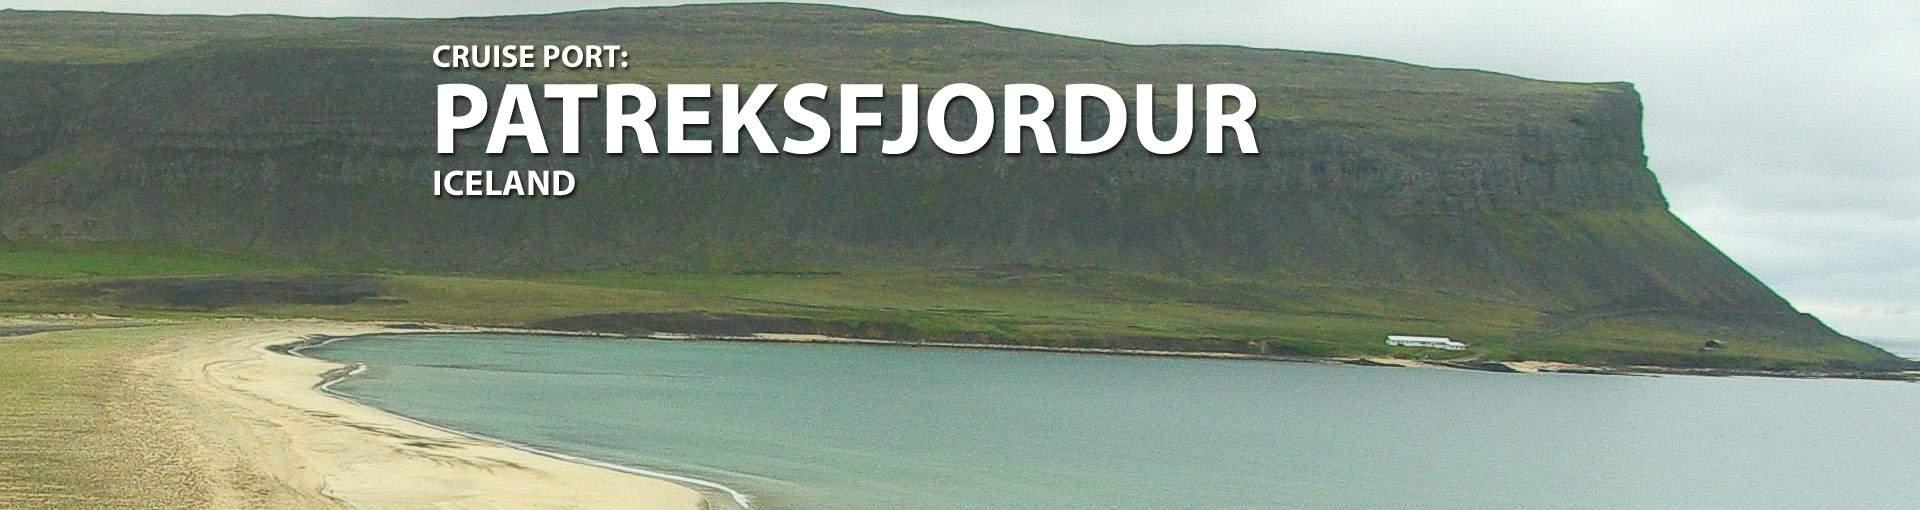 Patreksfjordur, Iceland Cruise Port